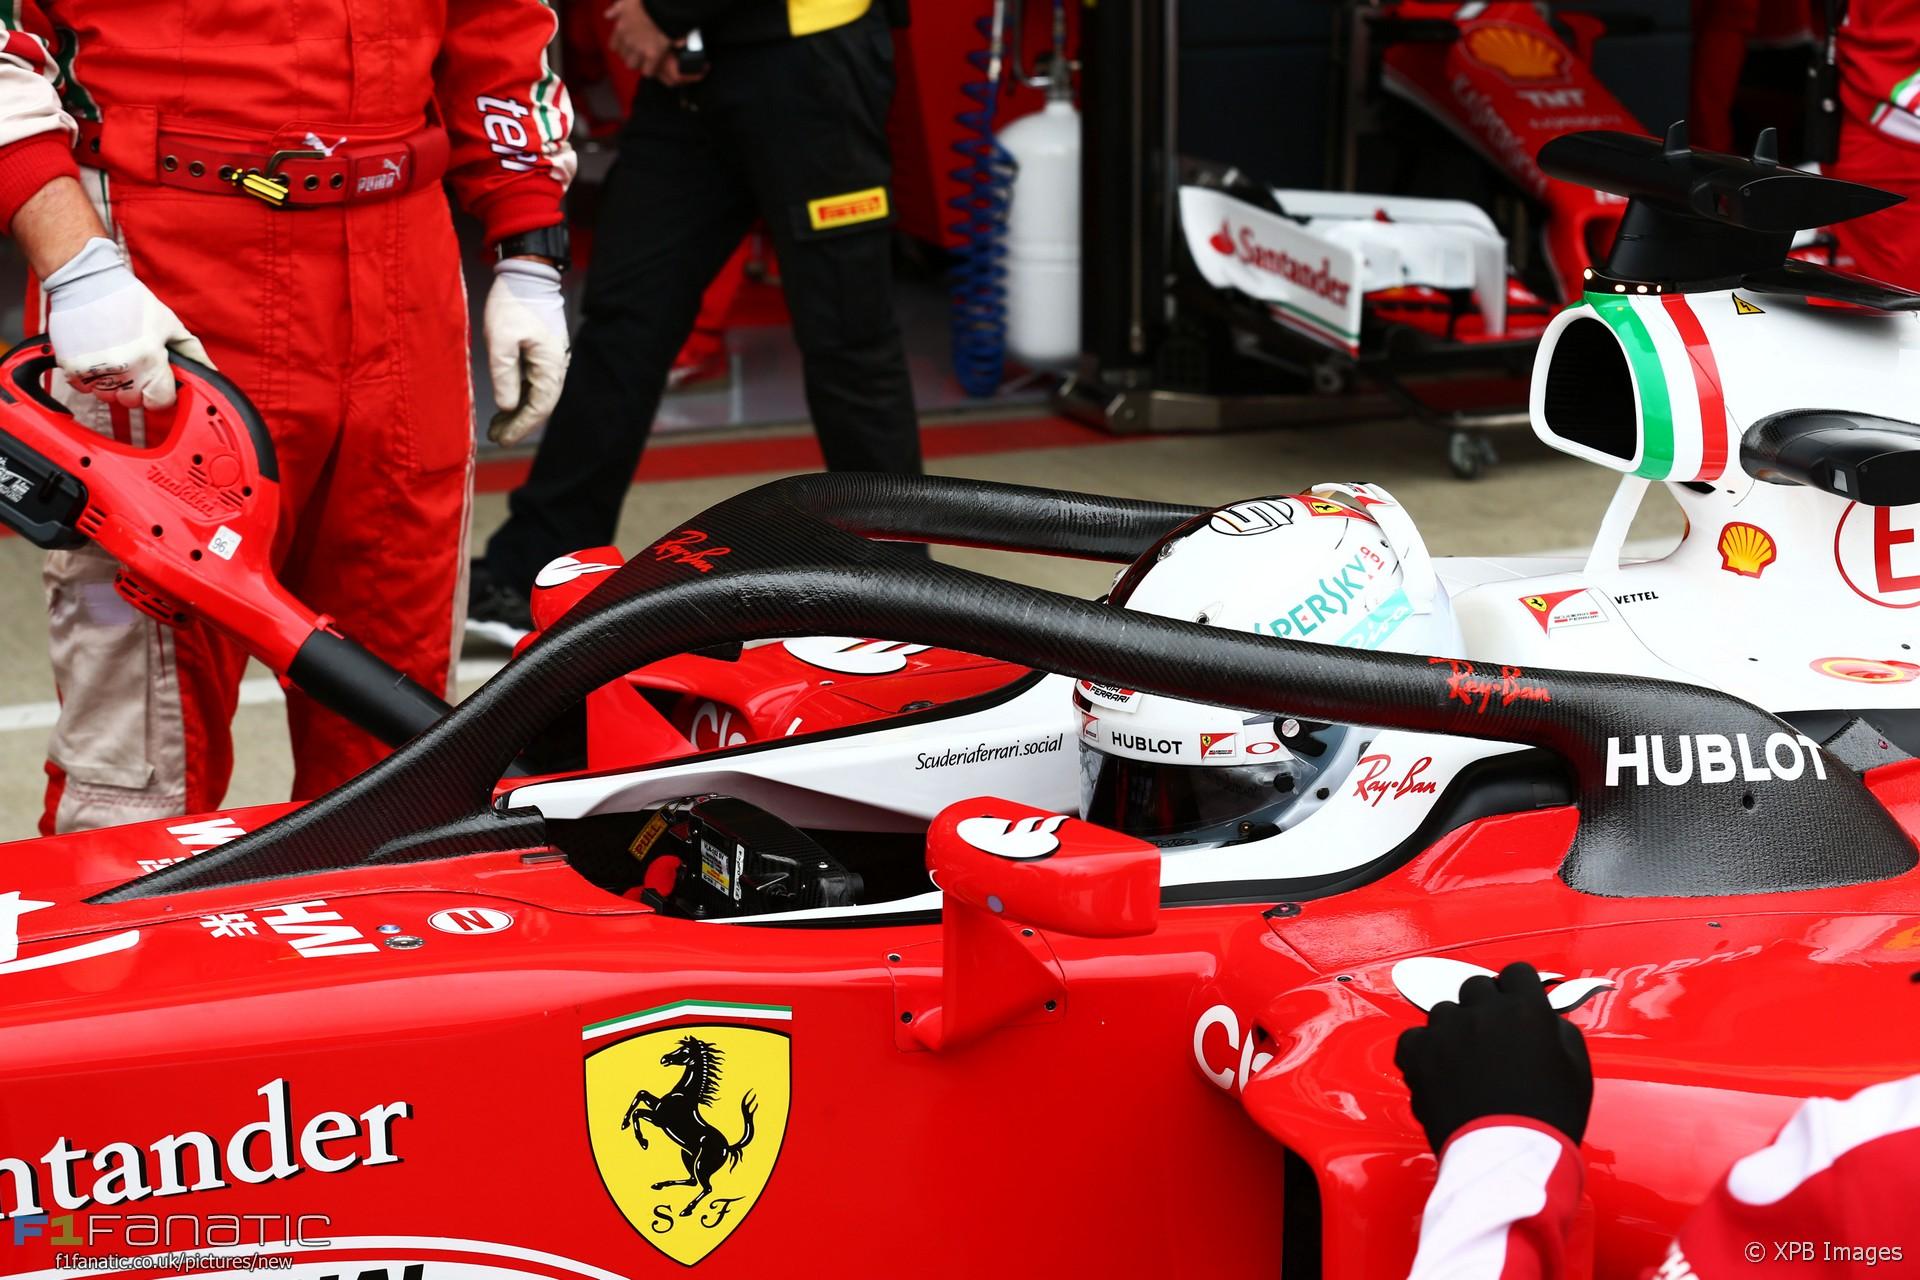 Sebastian Vettel, Ferrari, Silverstone, 2016